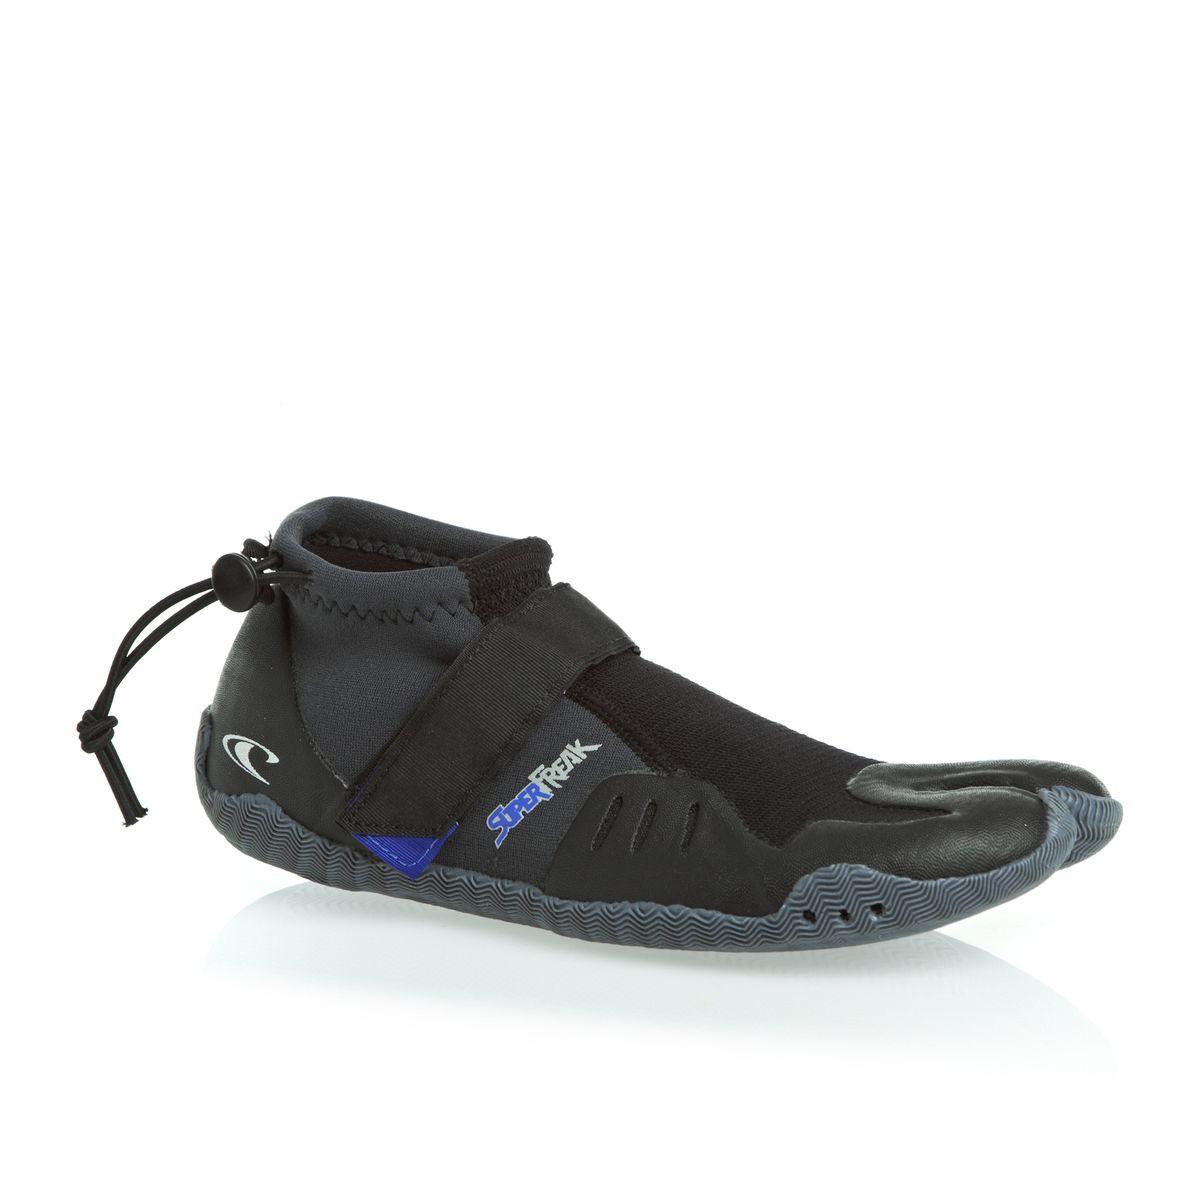 O'Neill Superfreak Tropical Split Toe Wetsuit Boots - 2mm